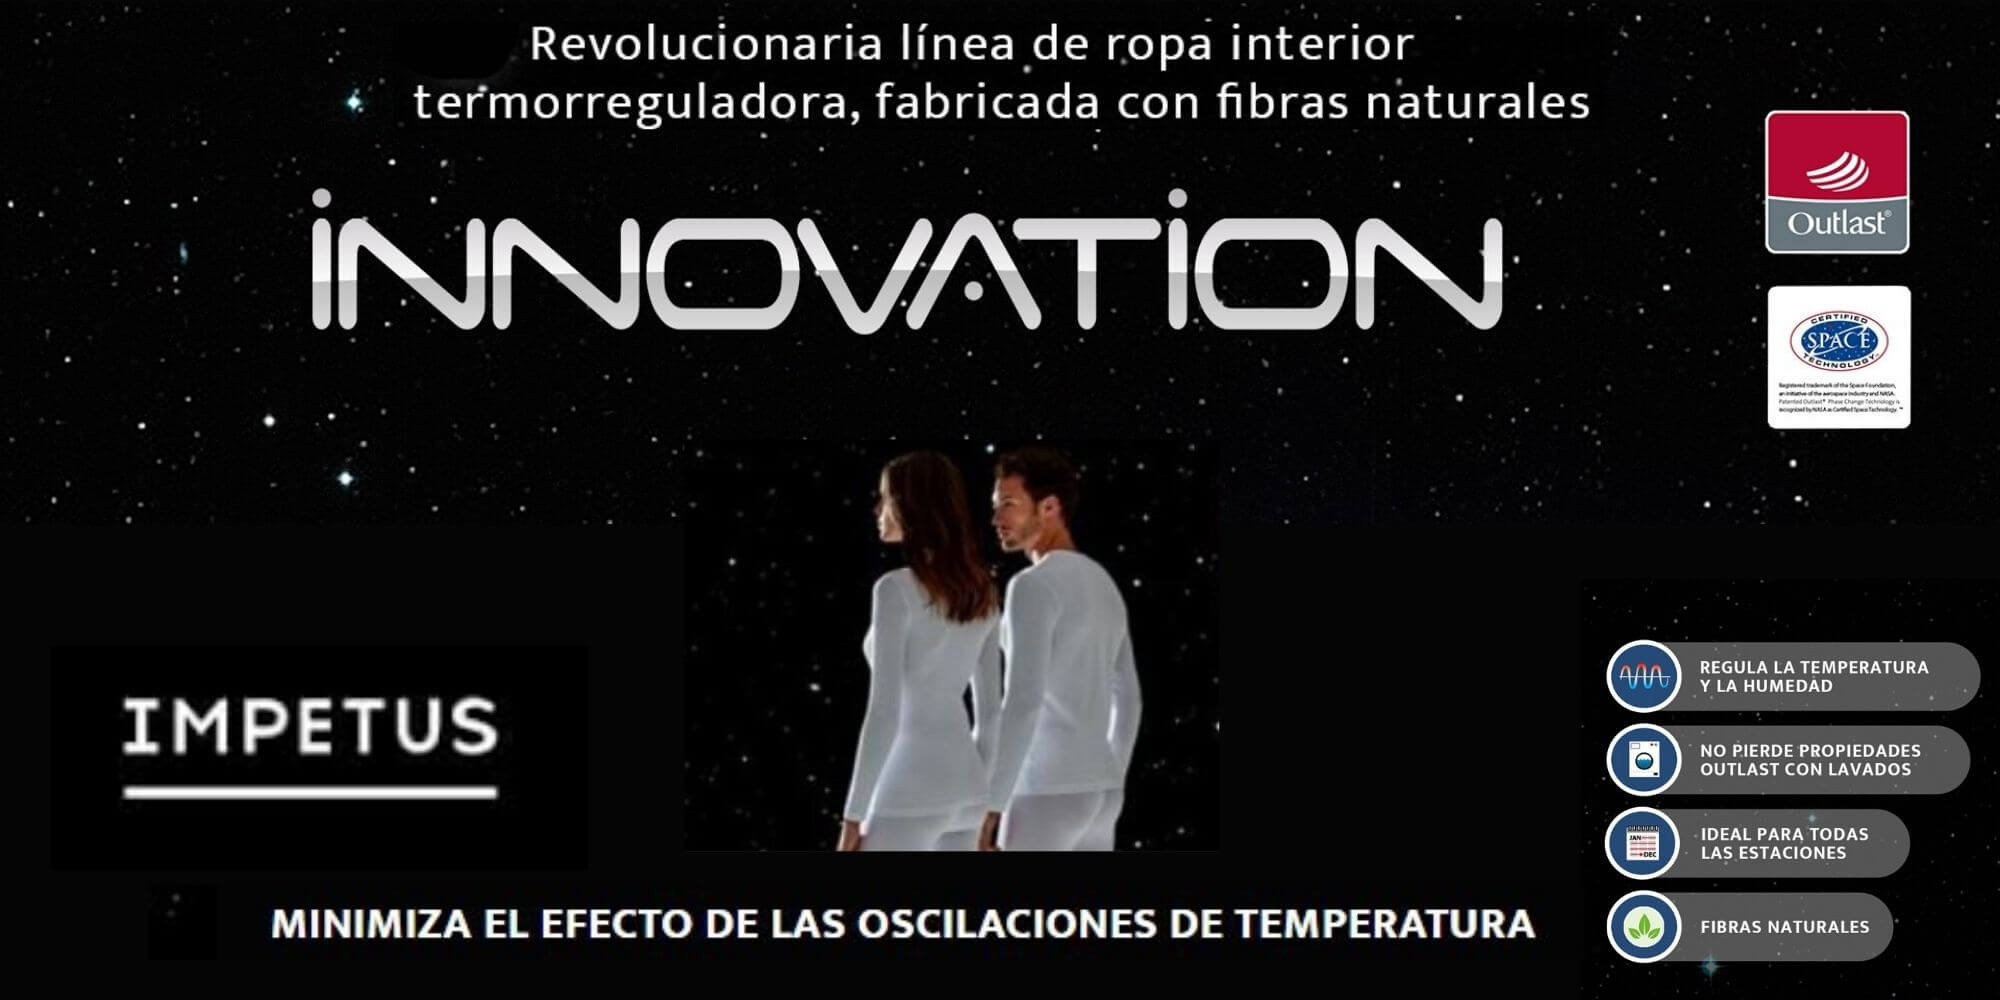 INNOVATION IMPETUS THERMOREGULADORAS